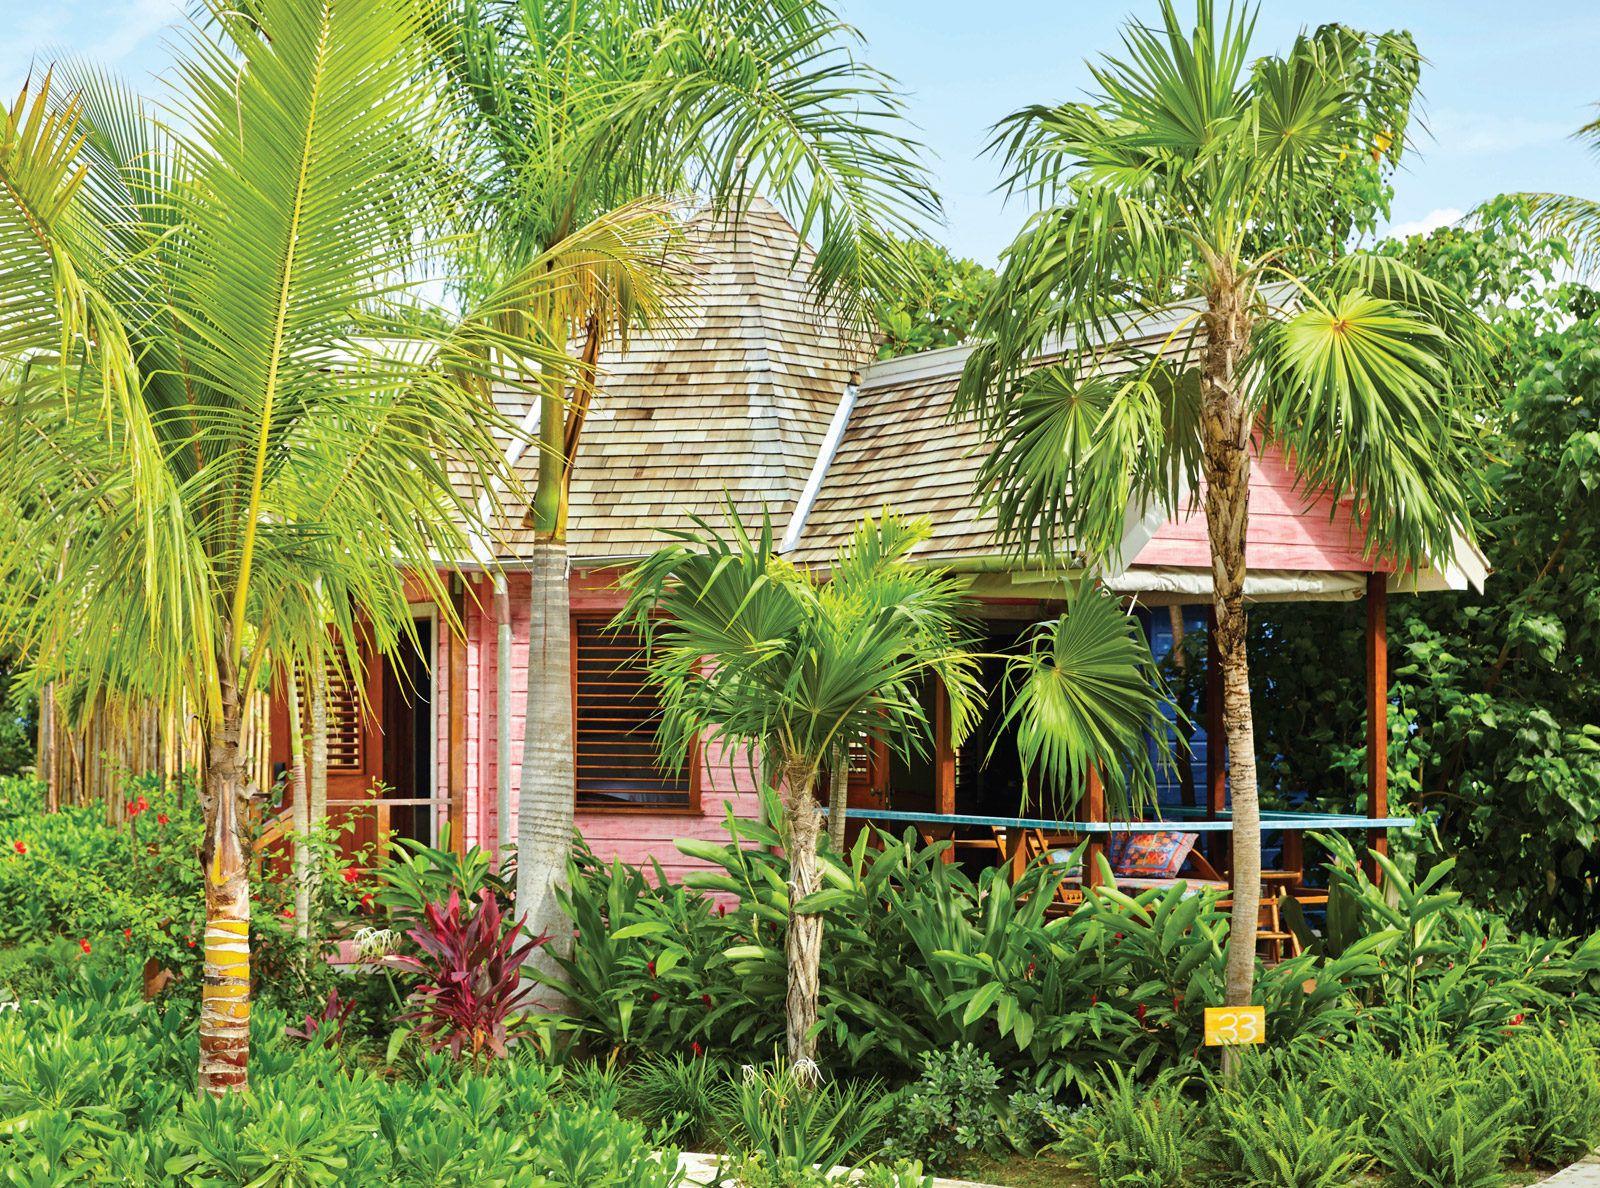 GoldenEye Resort: Jamaica Vacation Villa, Cottage or Hut Accomodations